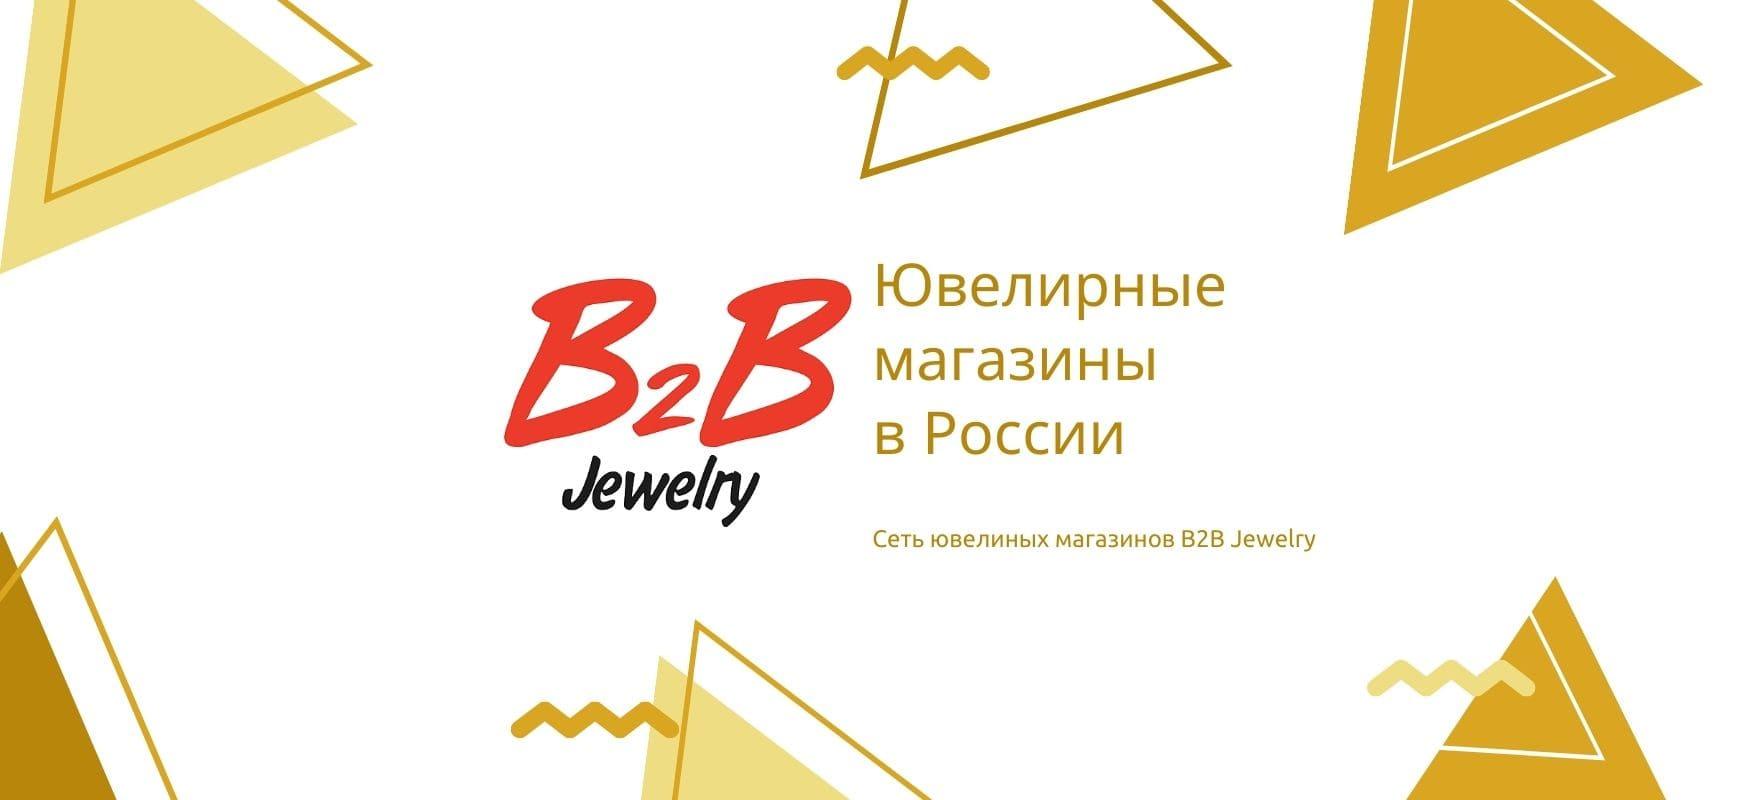 B2B.Jewelry в России